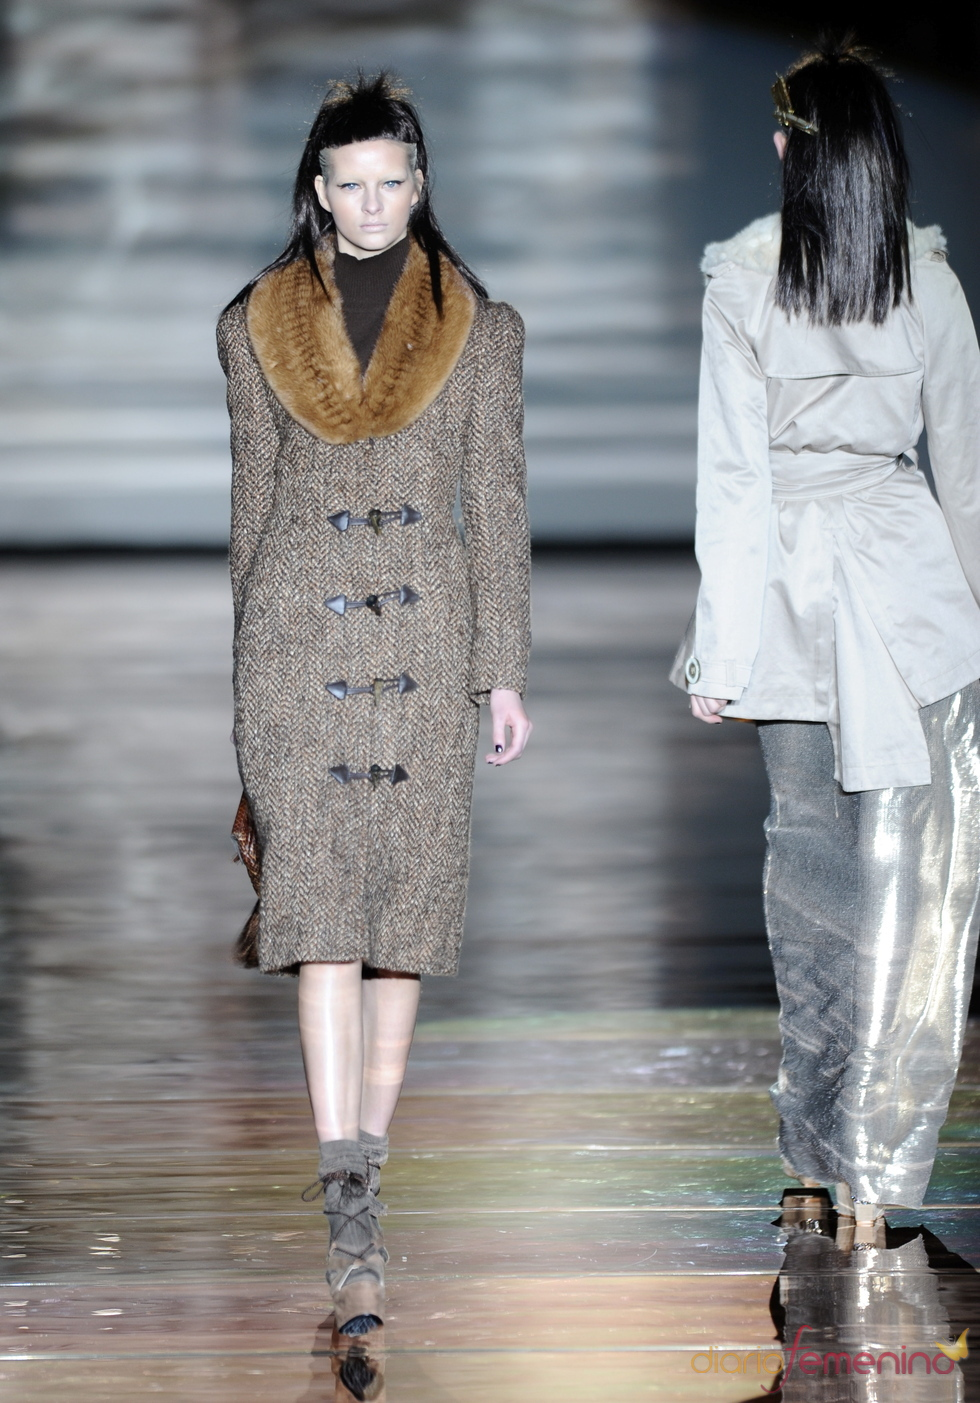 Abrigo de Roberto Verino. Cibeles Madrid Fashion Week 2011